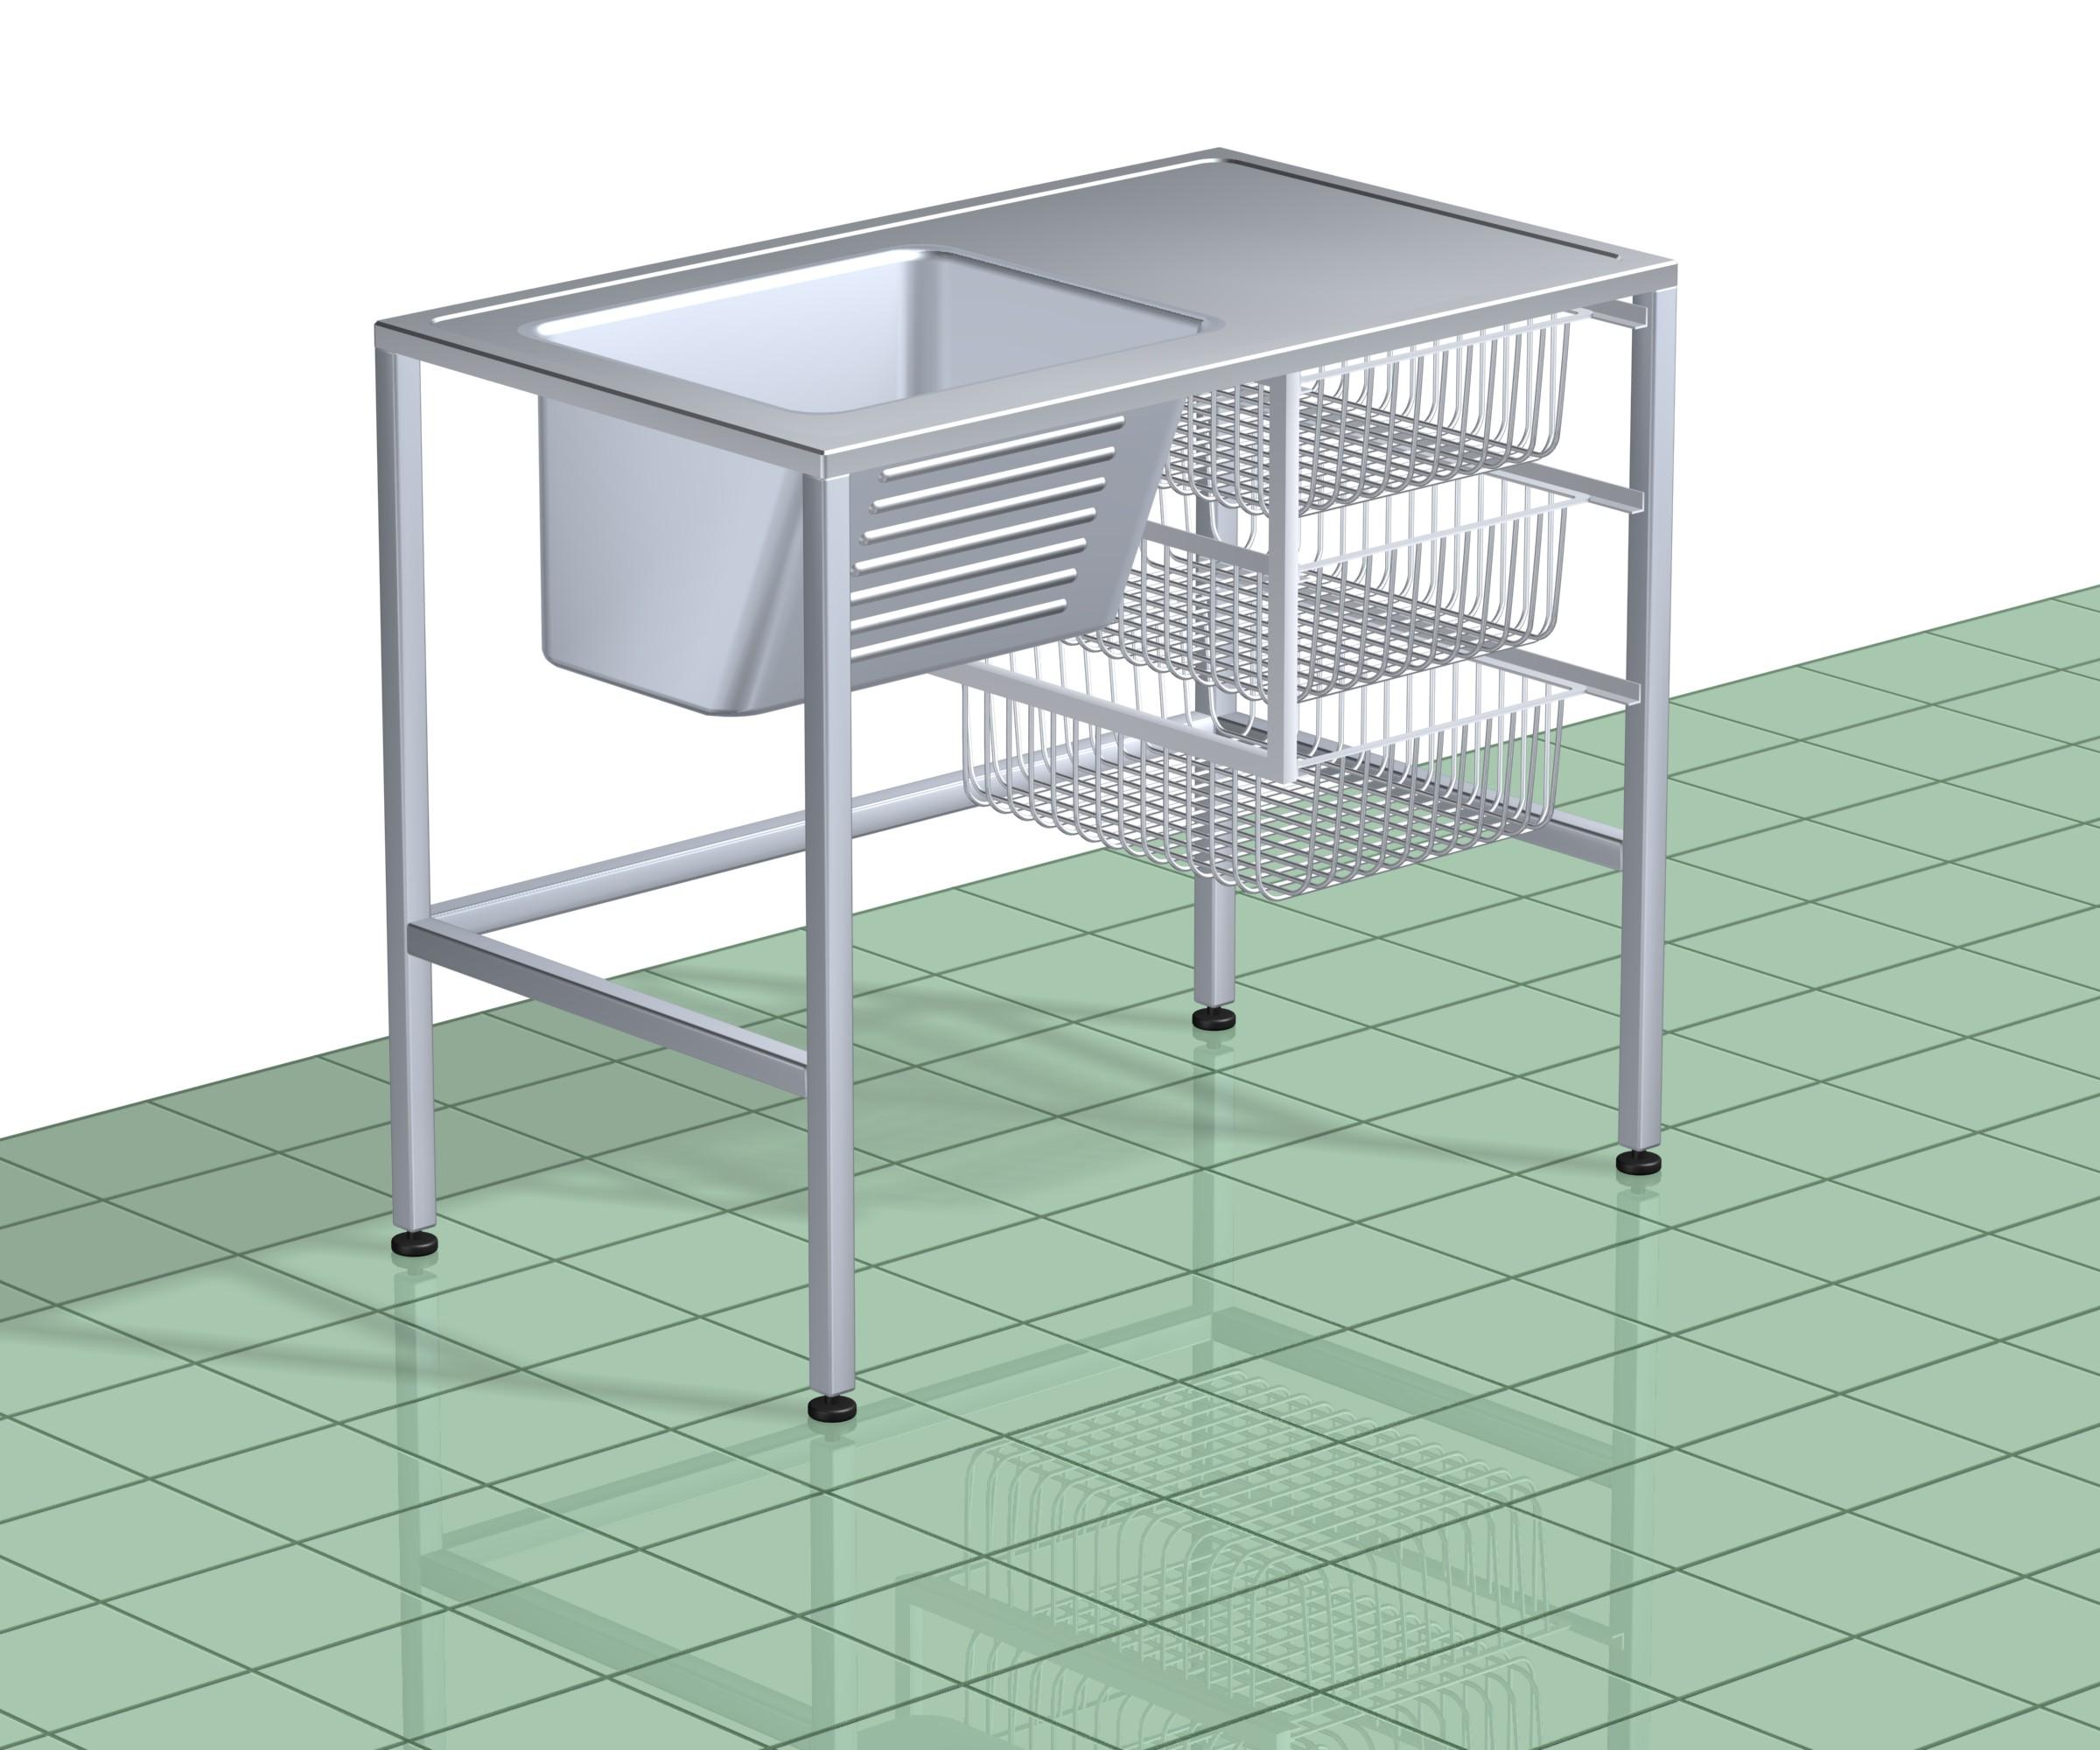 Pesuallaspöytä TPAP 1000 RST (O tai V) L